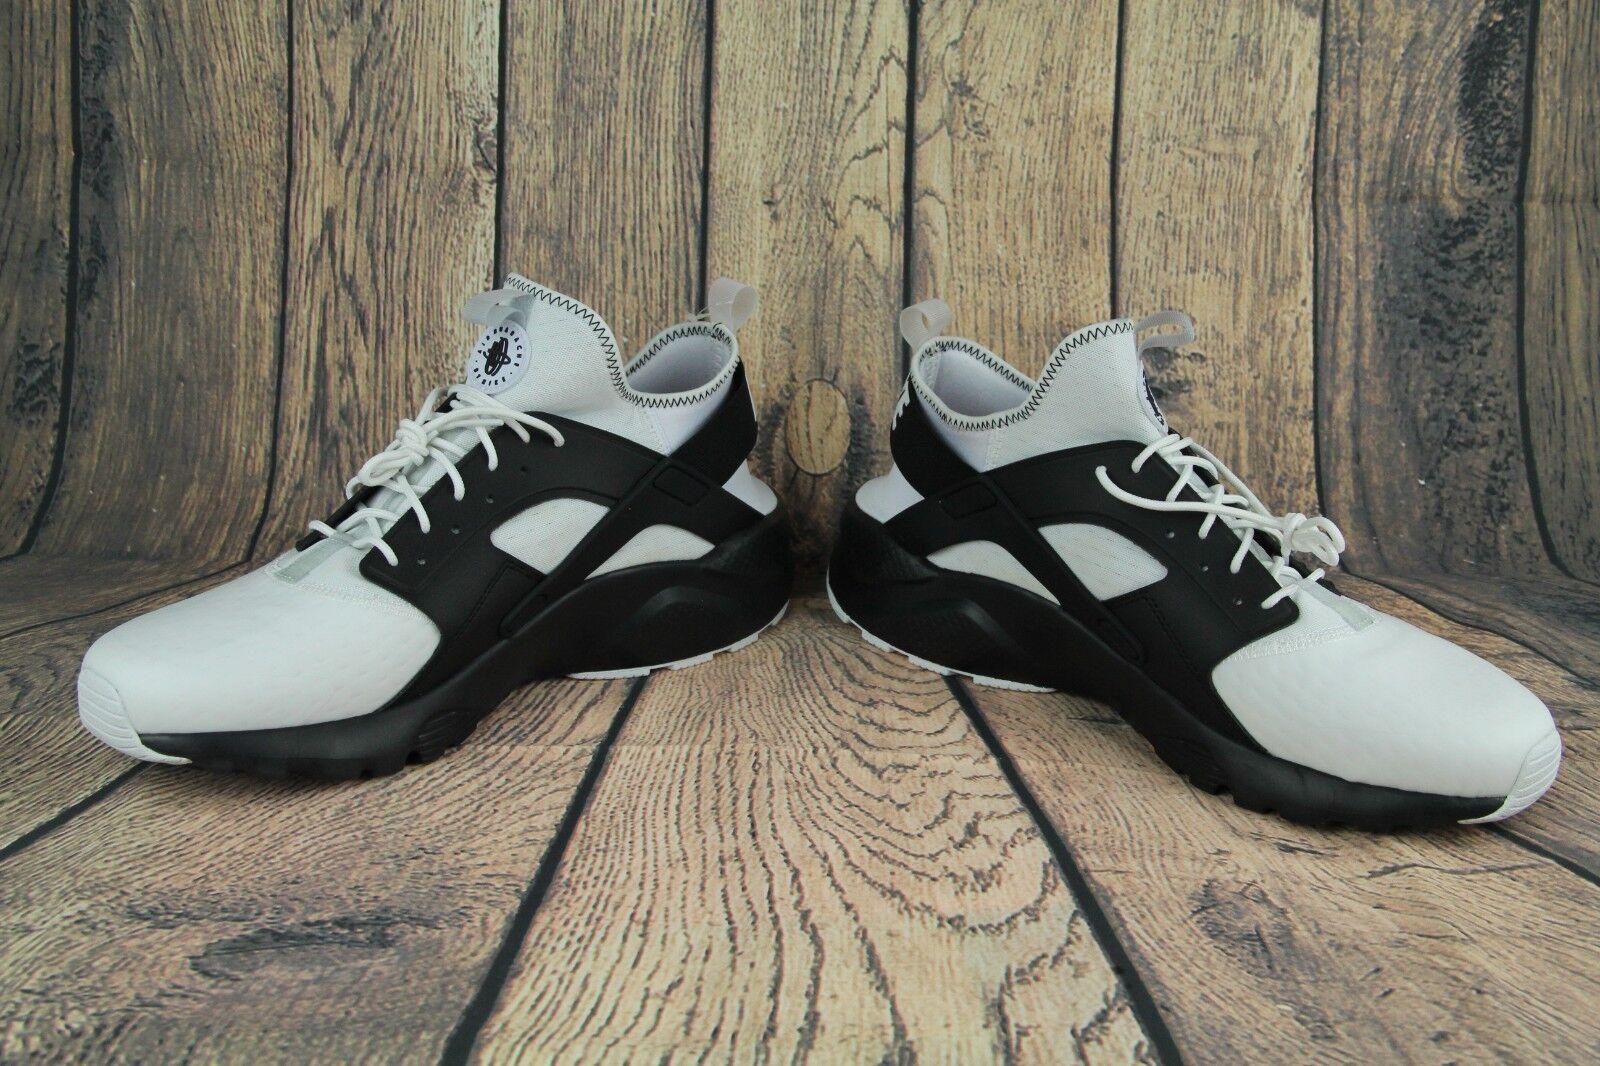 Nike air huarache huarache air laufen ultra - se laufschuhe weiß schwarzer keks 875841-100 sz. b921ad